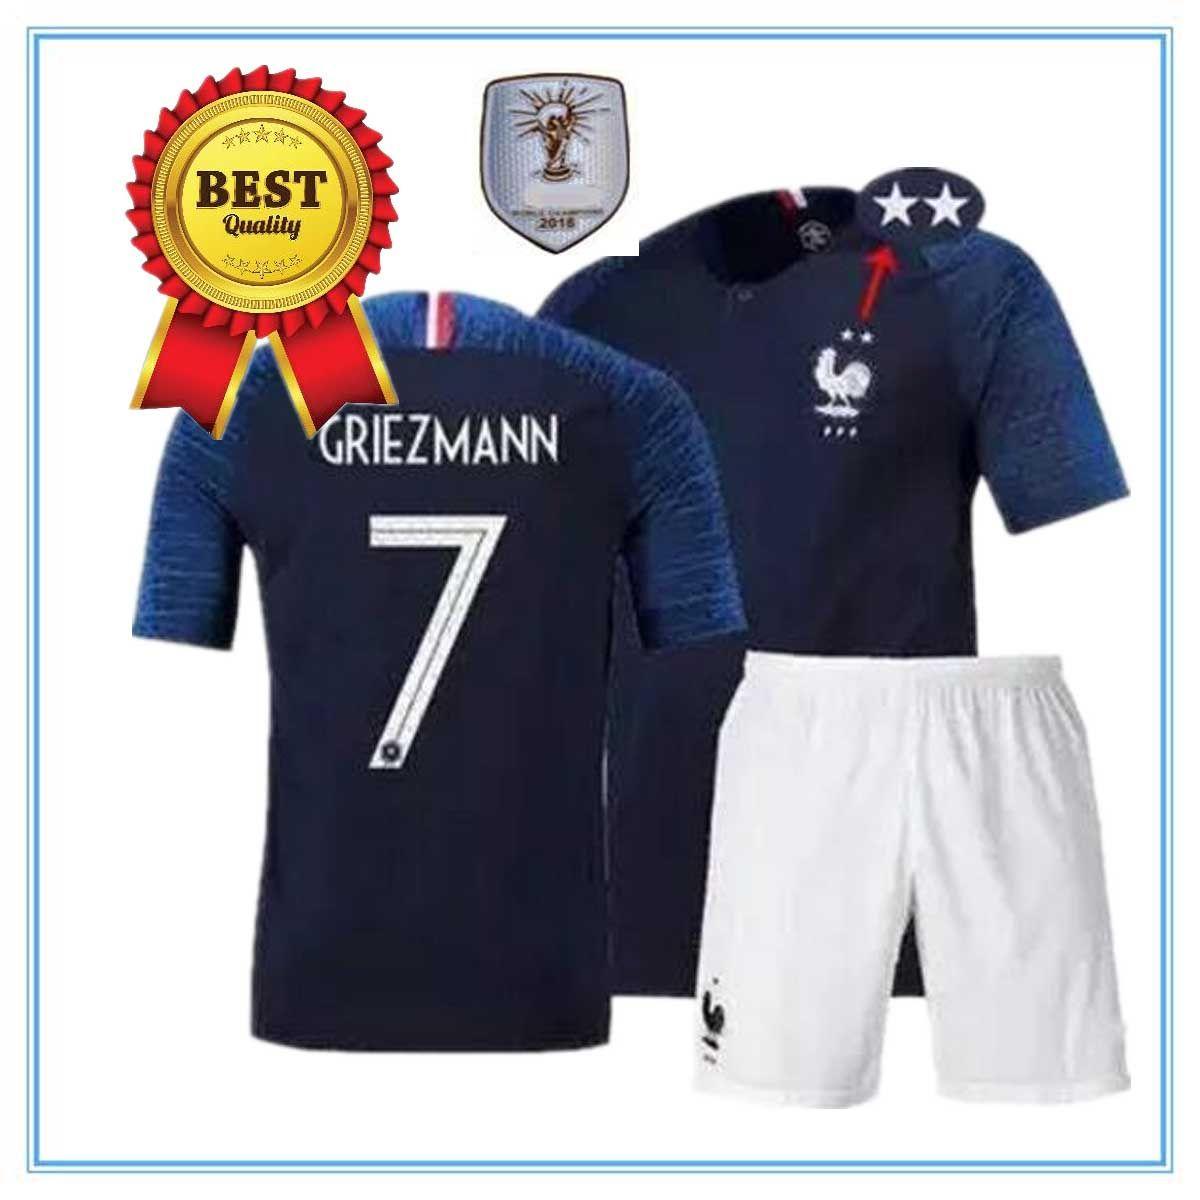 5f559665e 2019 Adult Full Kit 2018 MBAPPE Soccer Jersey POGBA Football Shirt ...